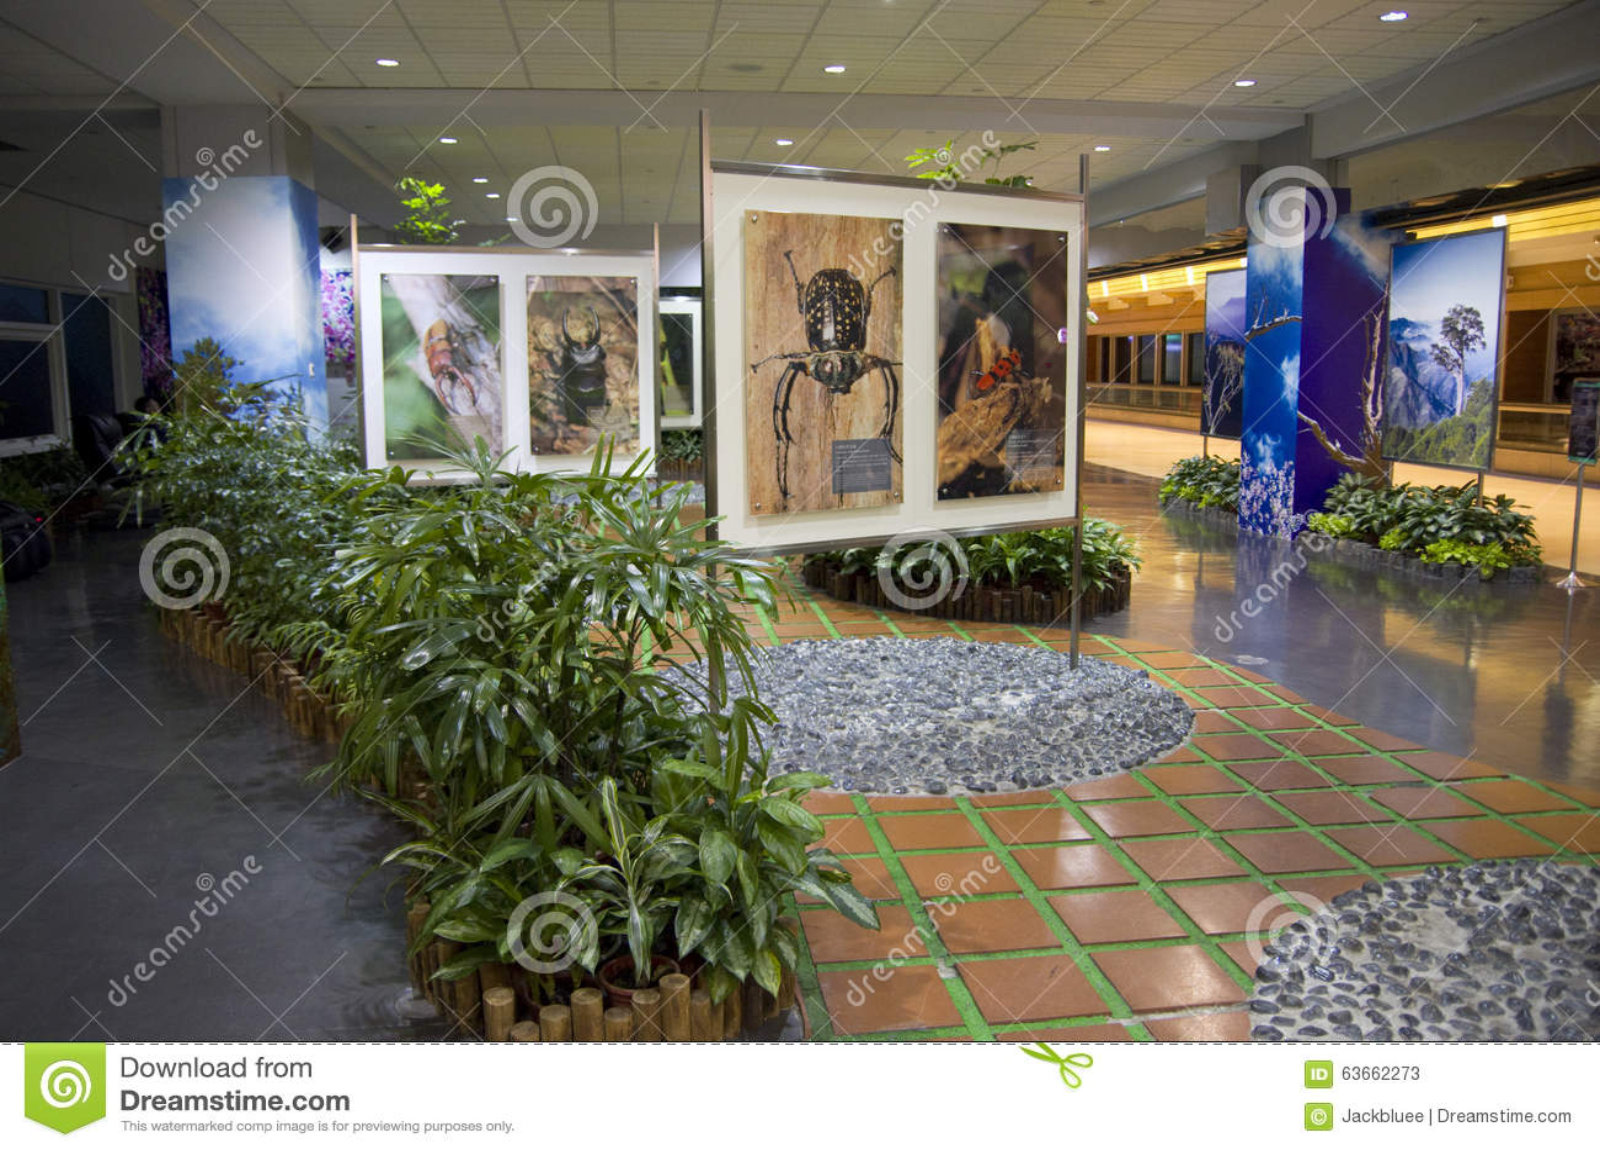 Interior design ideas airport waiting room editorial for Garden room interior ideas